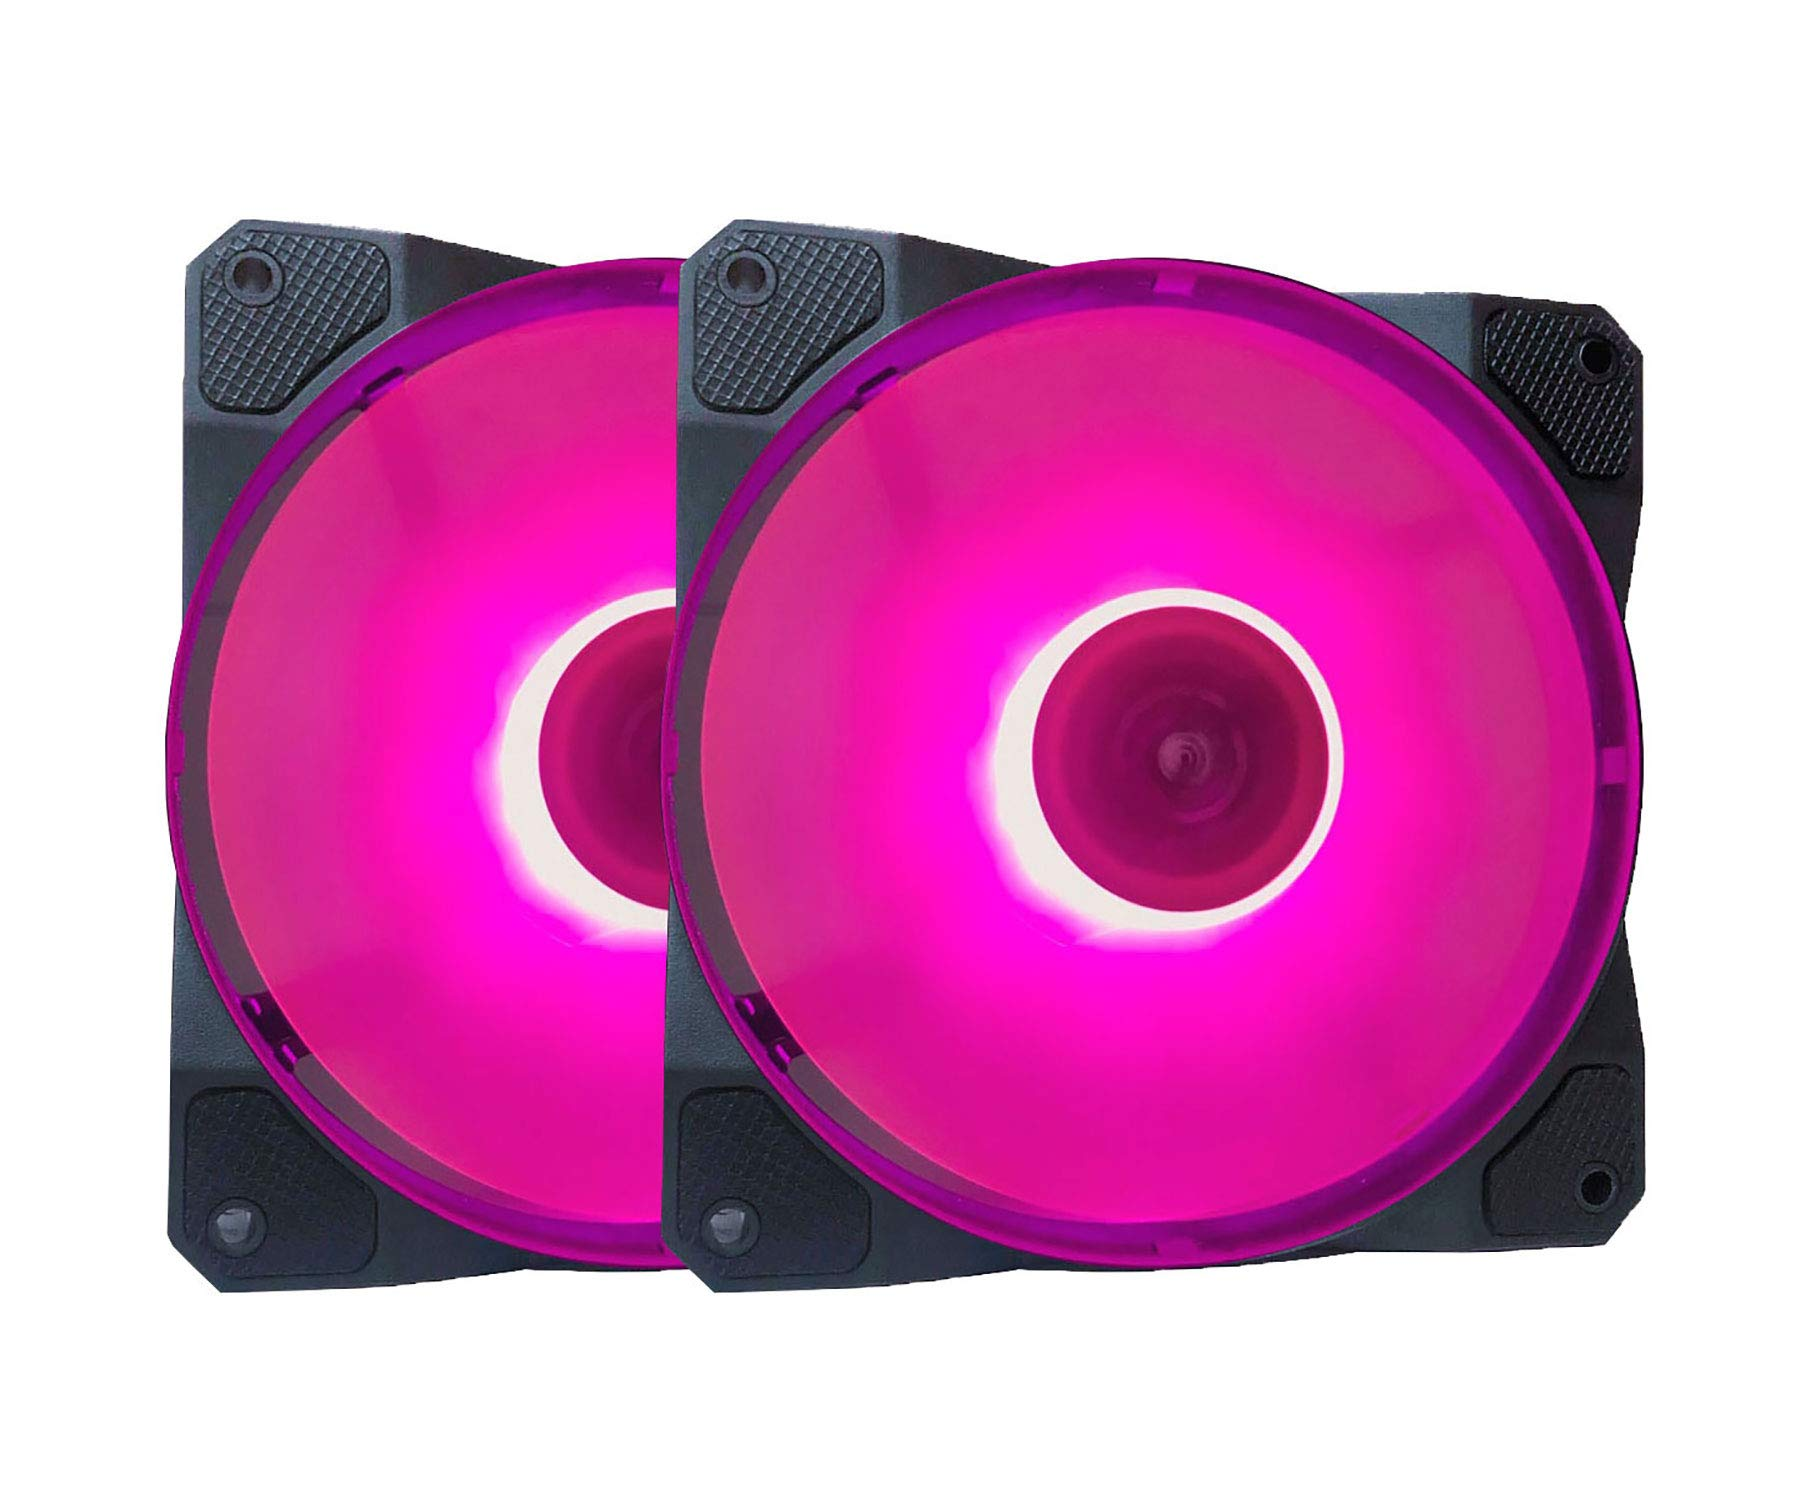 APEVIA CO212L-PK Cosmos 120mm Pink LED Ultra Silent Case Fan w/ 16 LEDs & Anti-Vibration Rubber Pads (2 Pk)